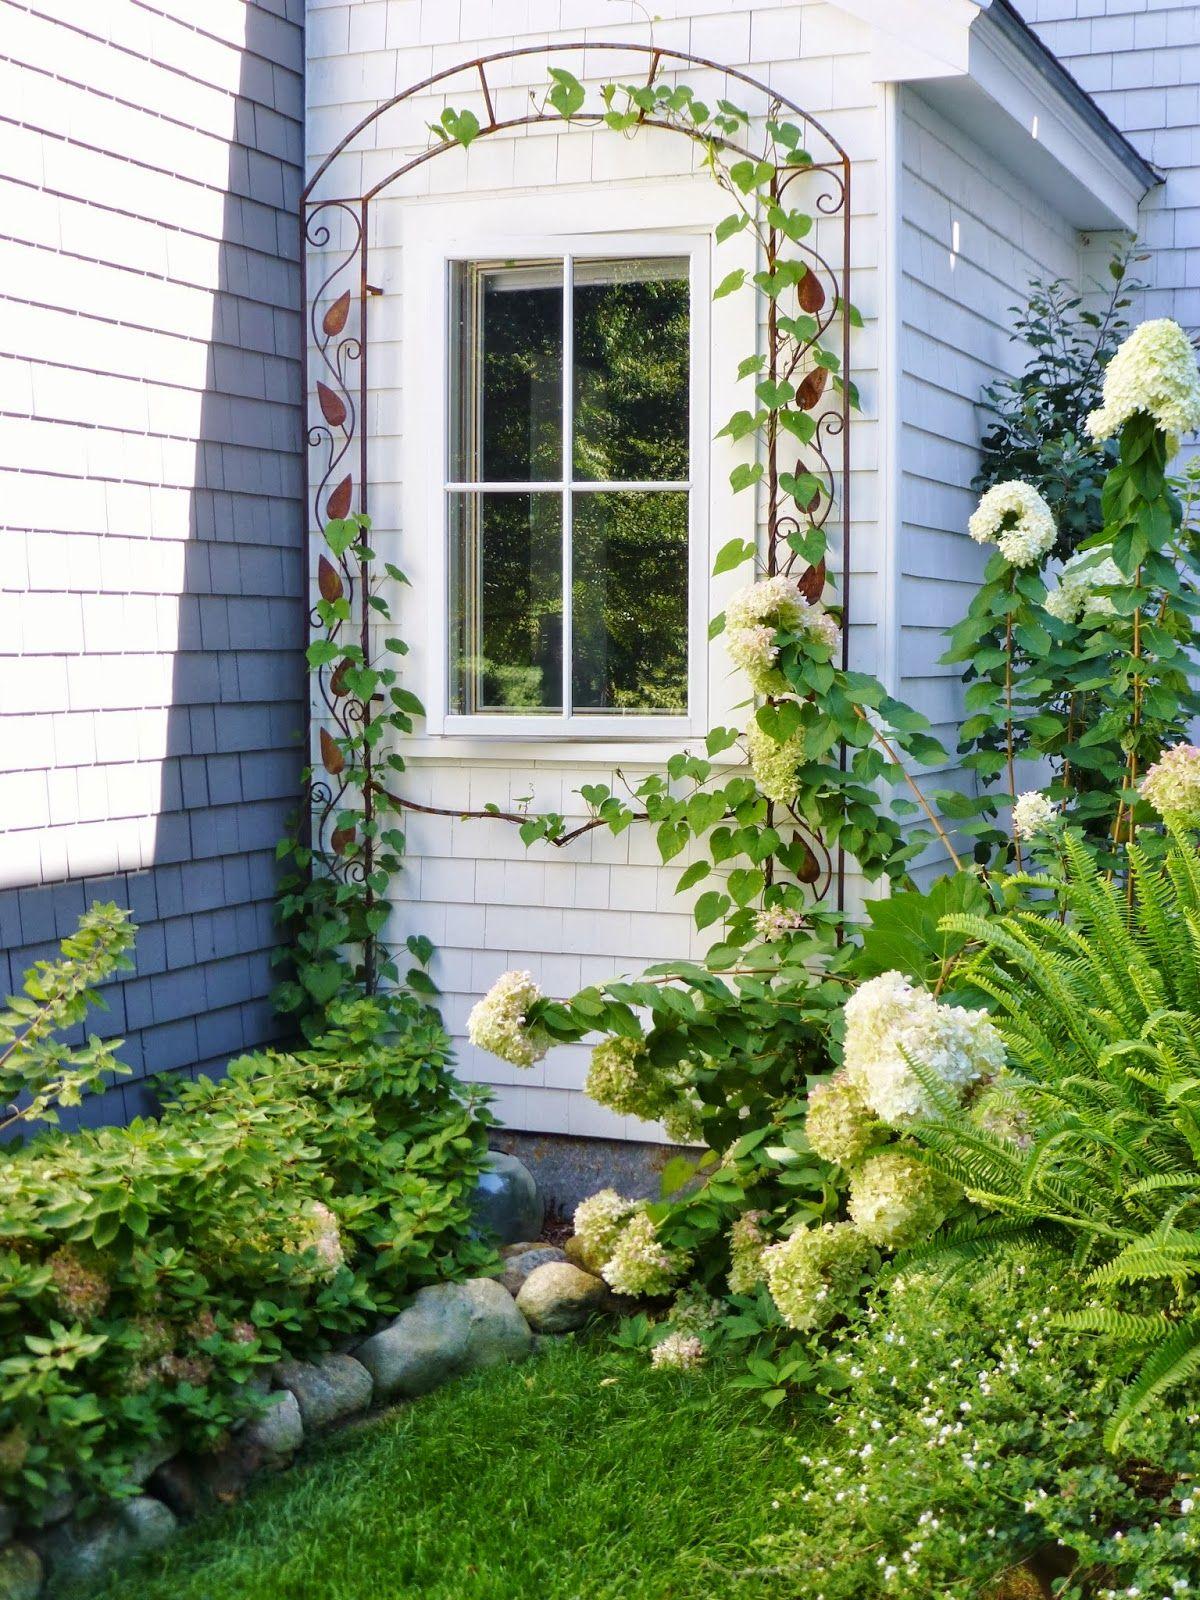 Wrought Iron Arbor | Landscape | Pinterest | Arbors, Wrought iron ...